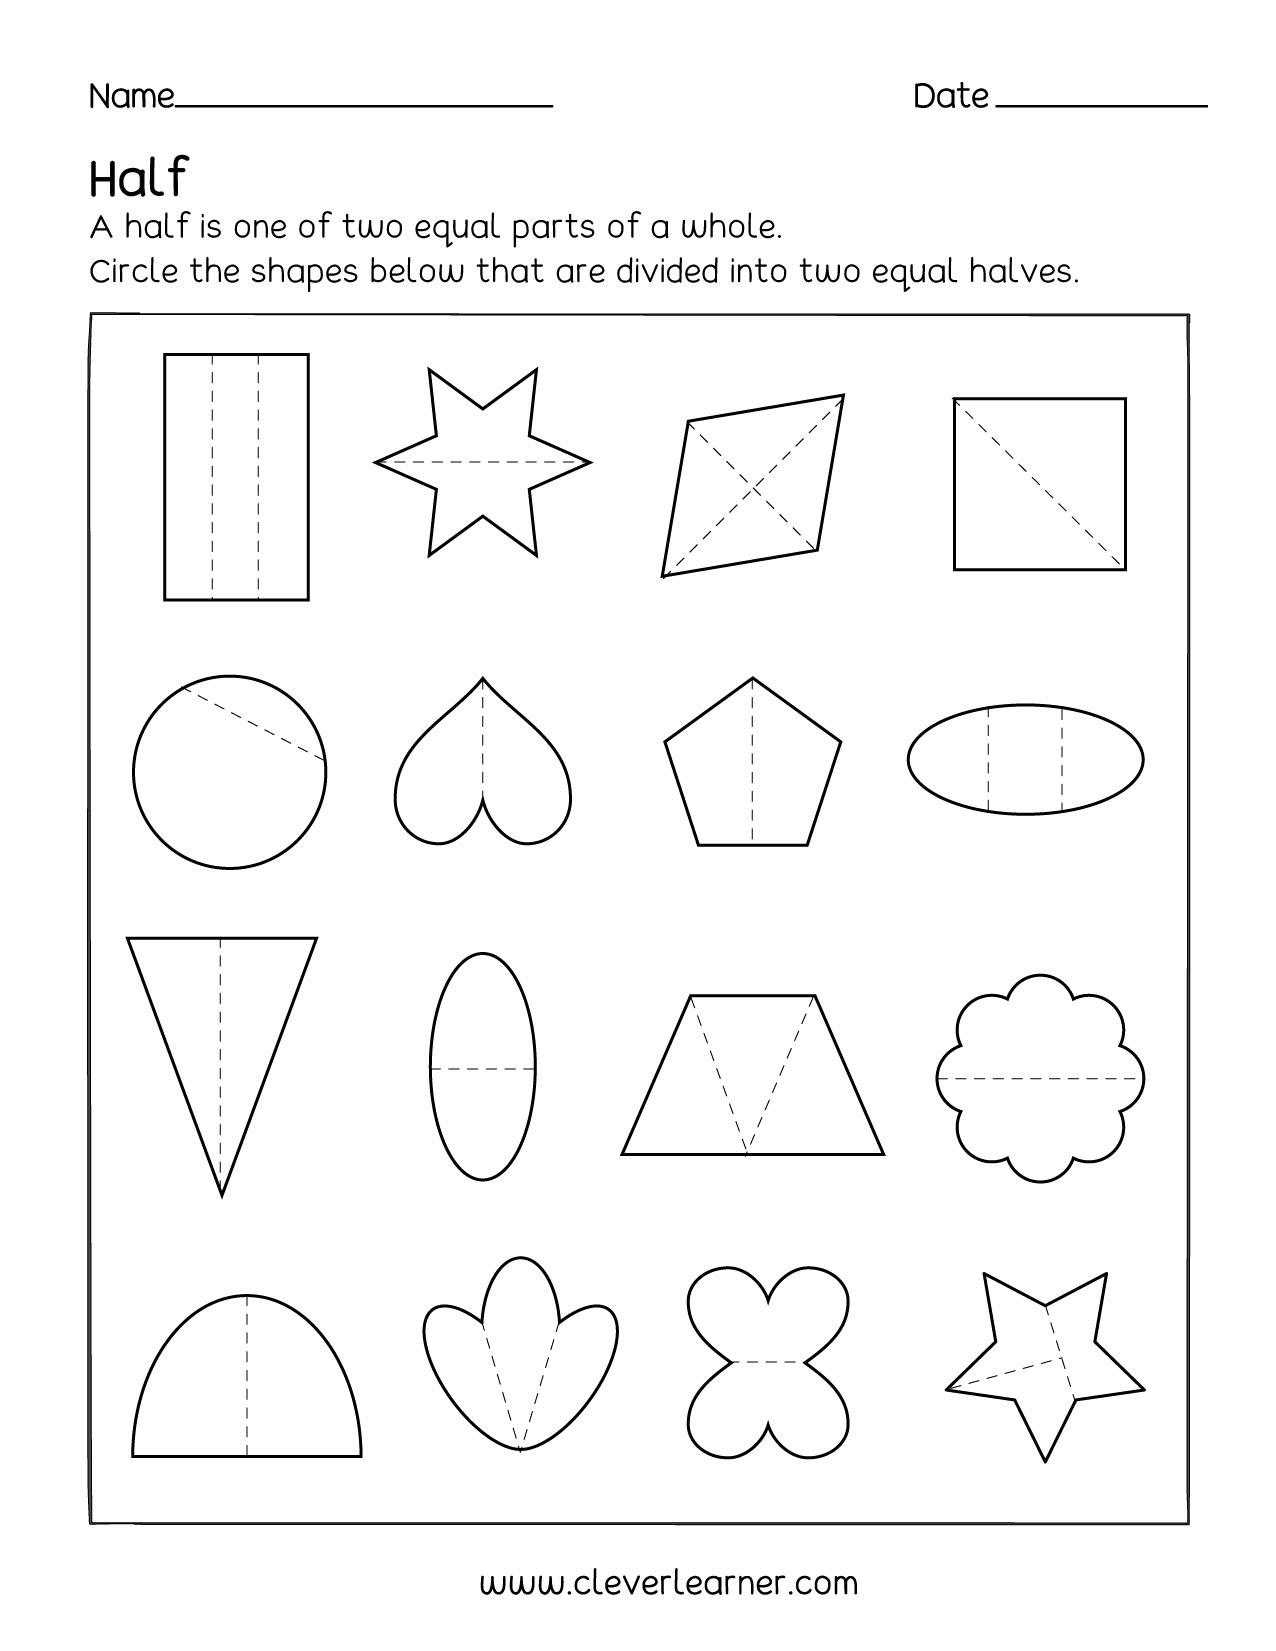 Fun Activity On Fractions Half 1 2 Worksheets For Children